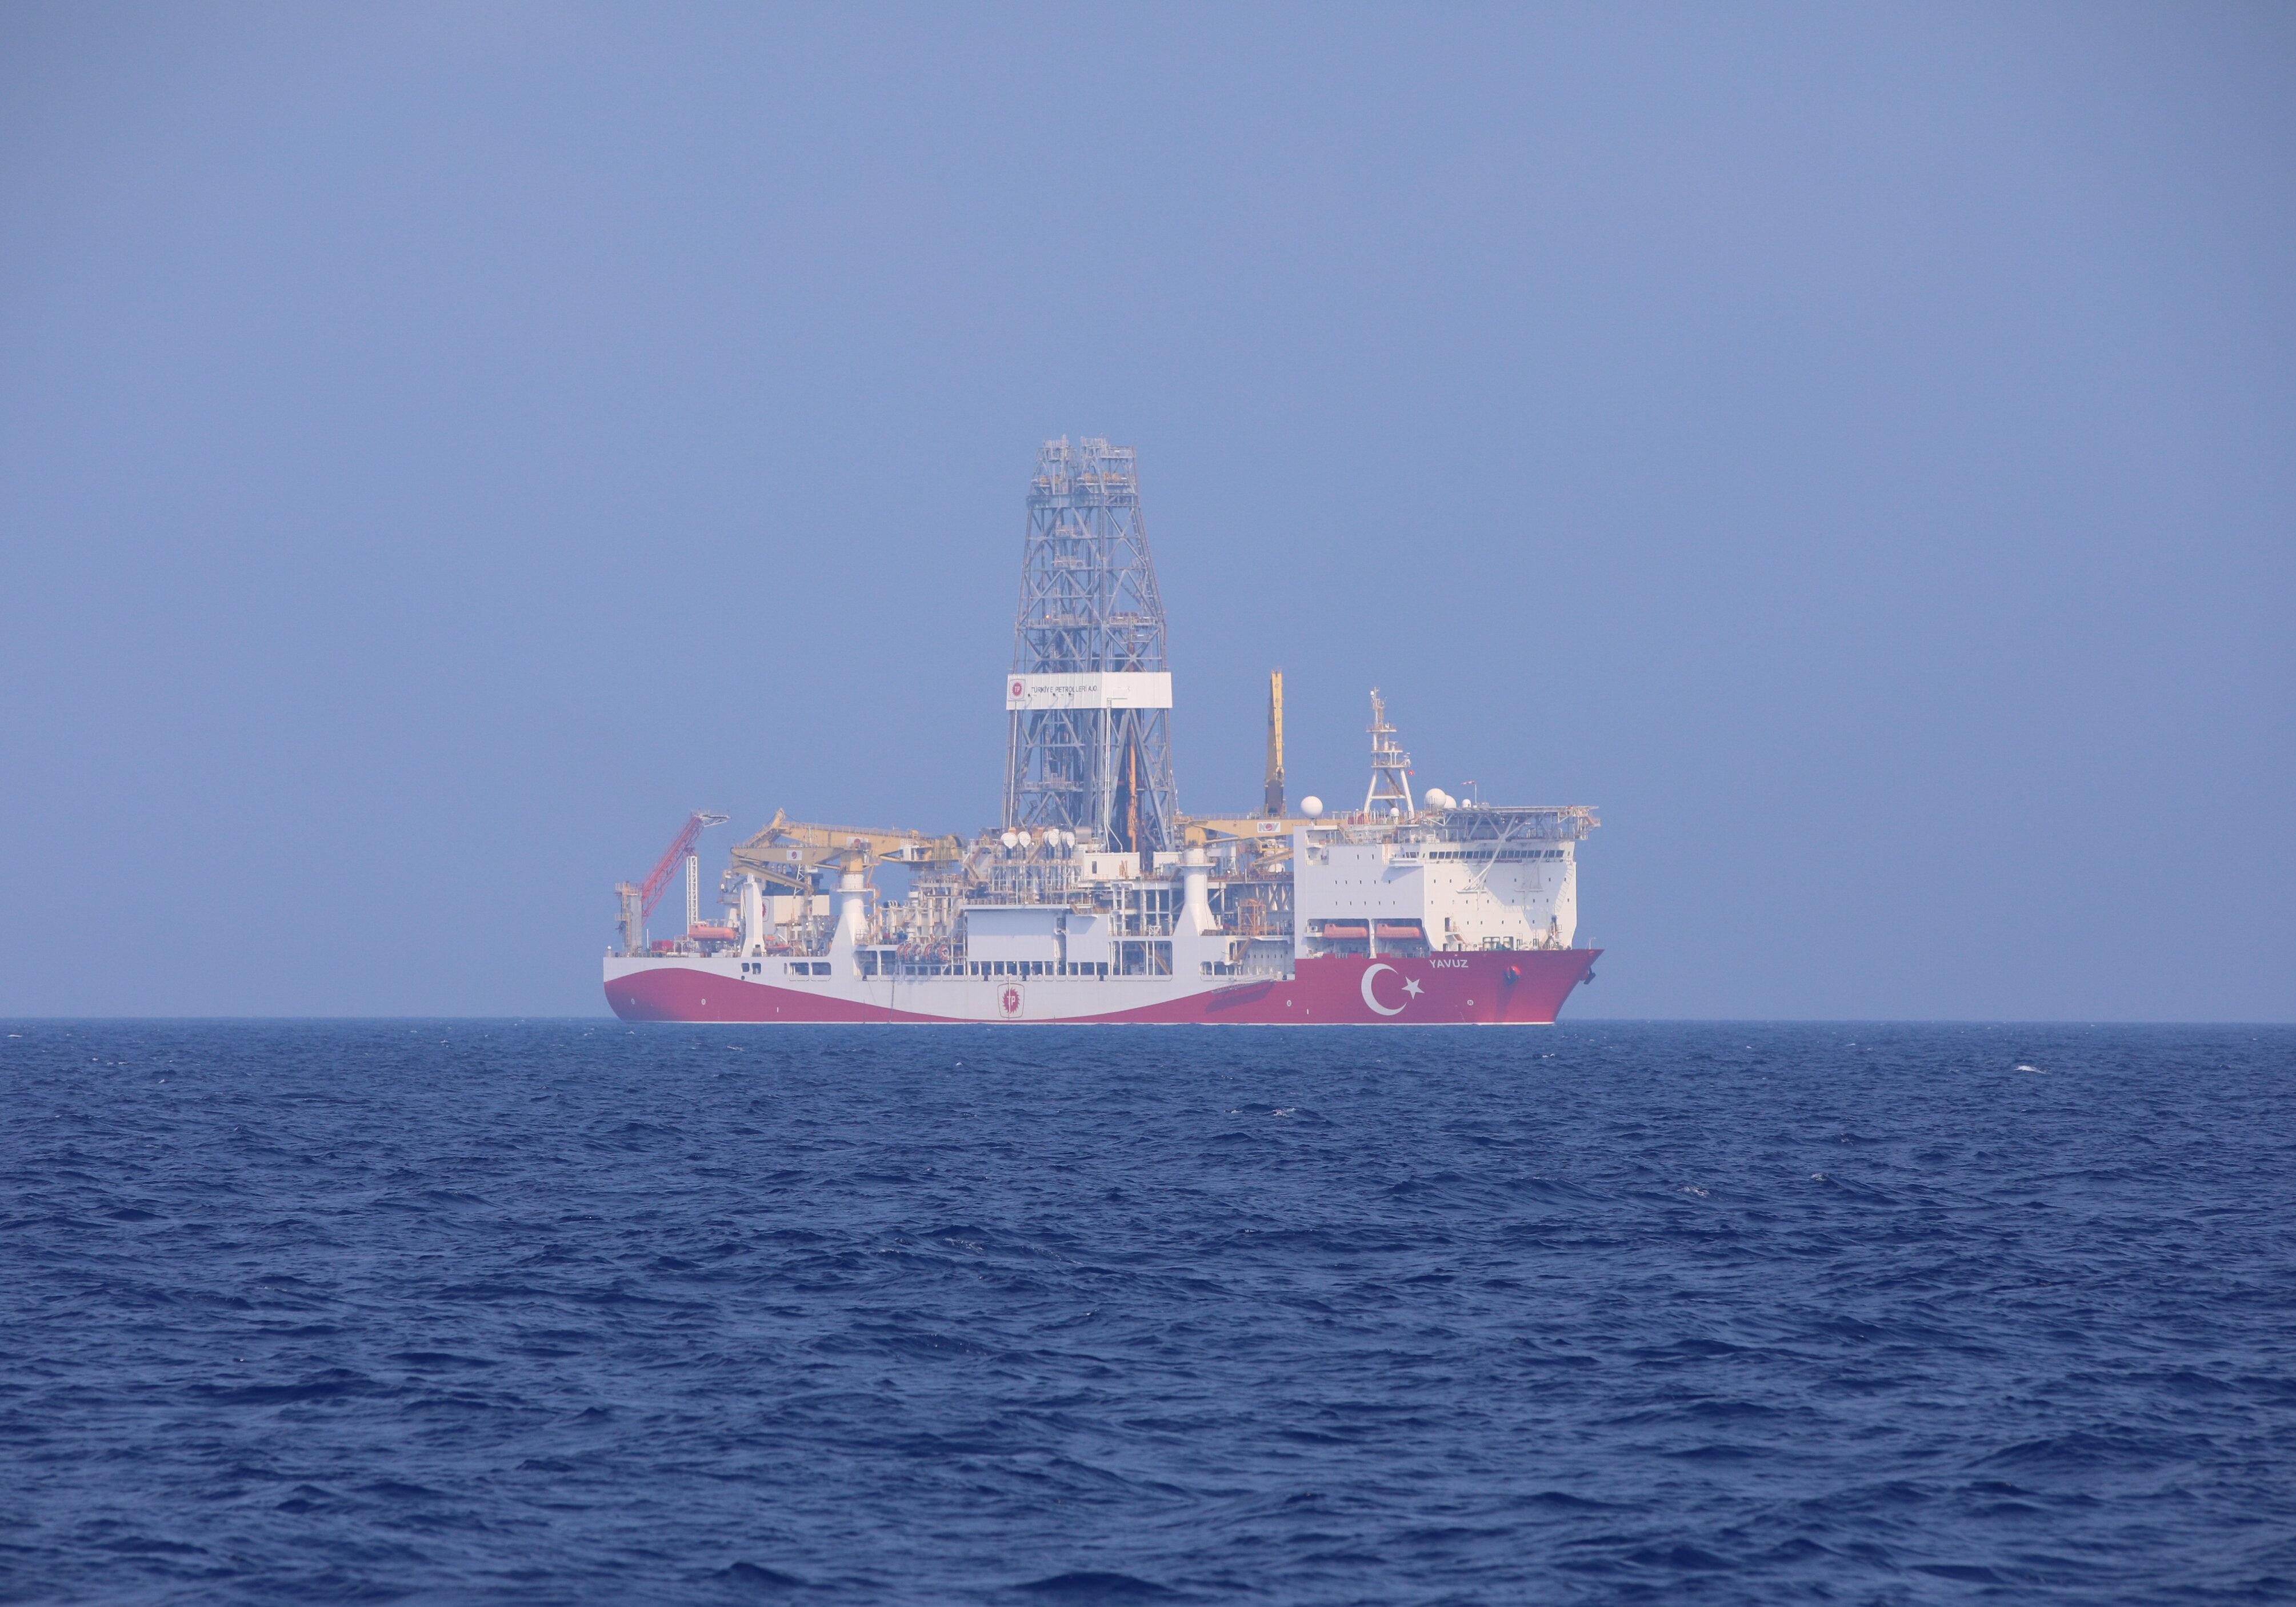 Turkey's drillship 'Yavuz' begins operations in Eastern Mediterranean